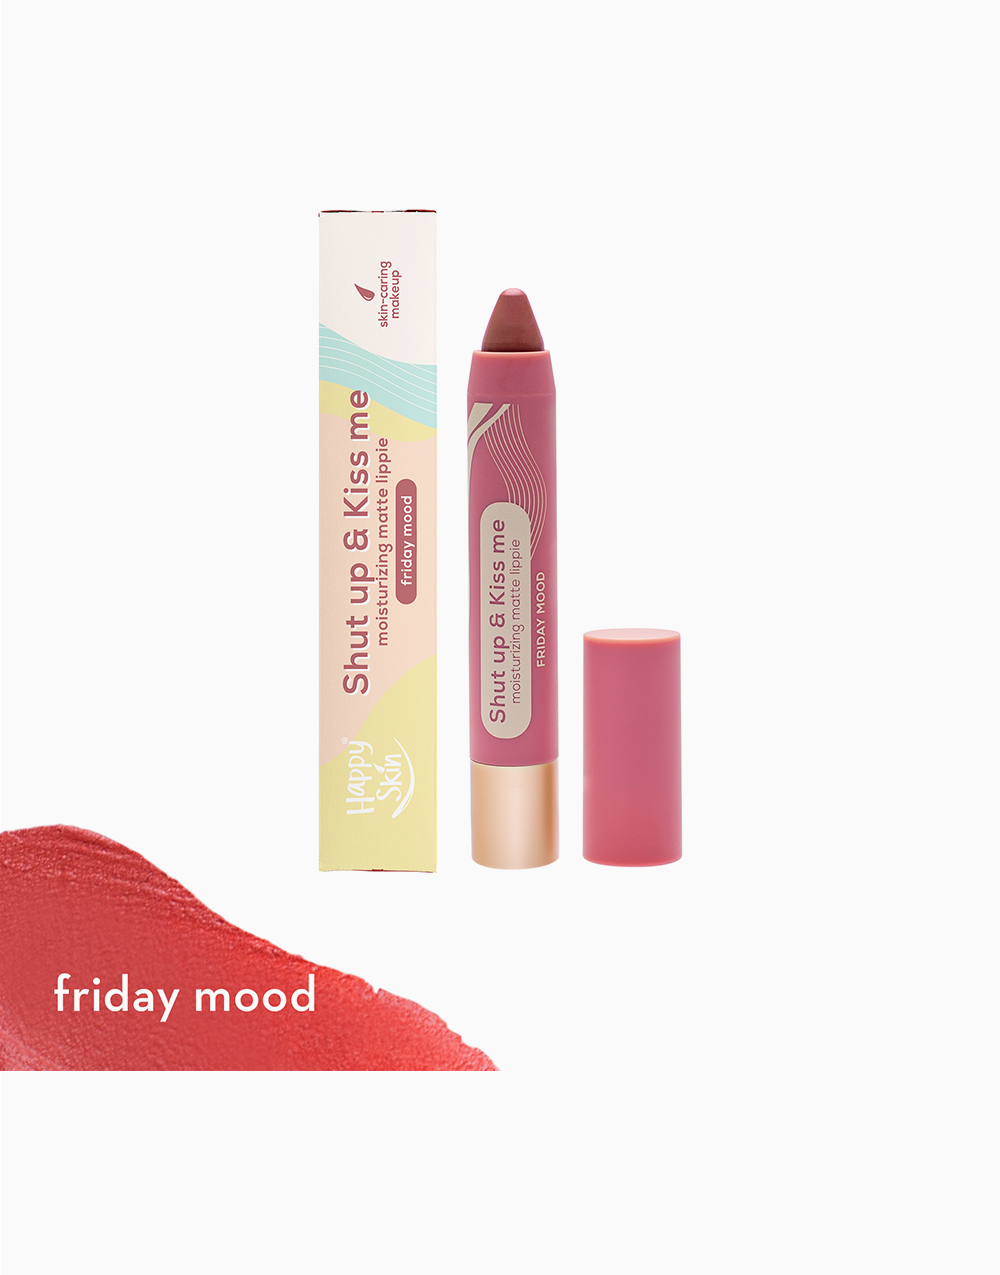 Shut Up & Kiss me Moisturizing Matte Lippie by Happy Skin   Friday Mood